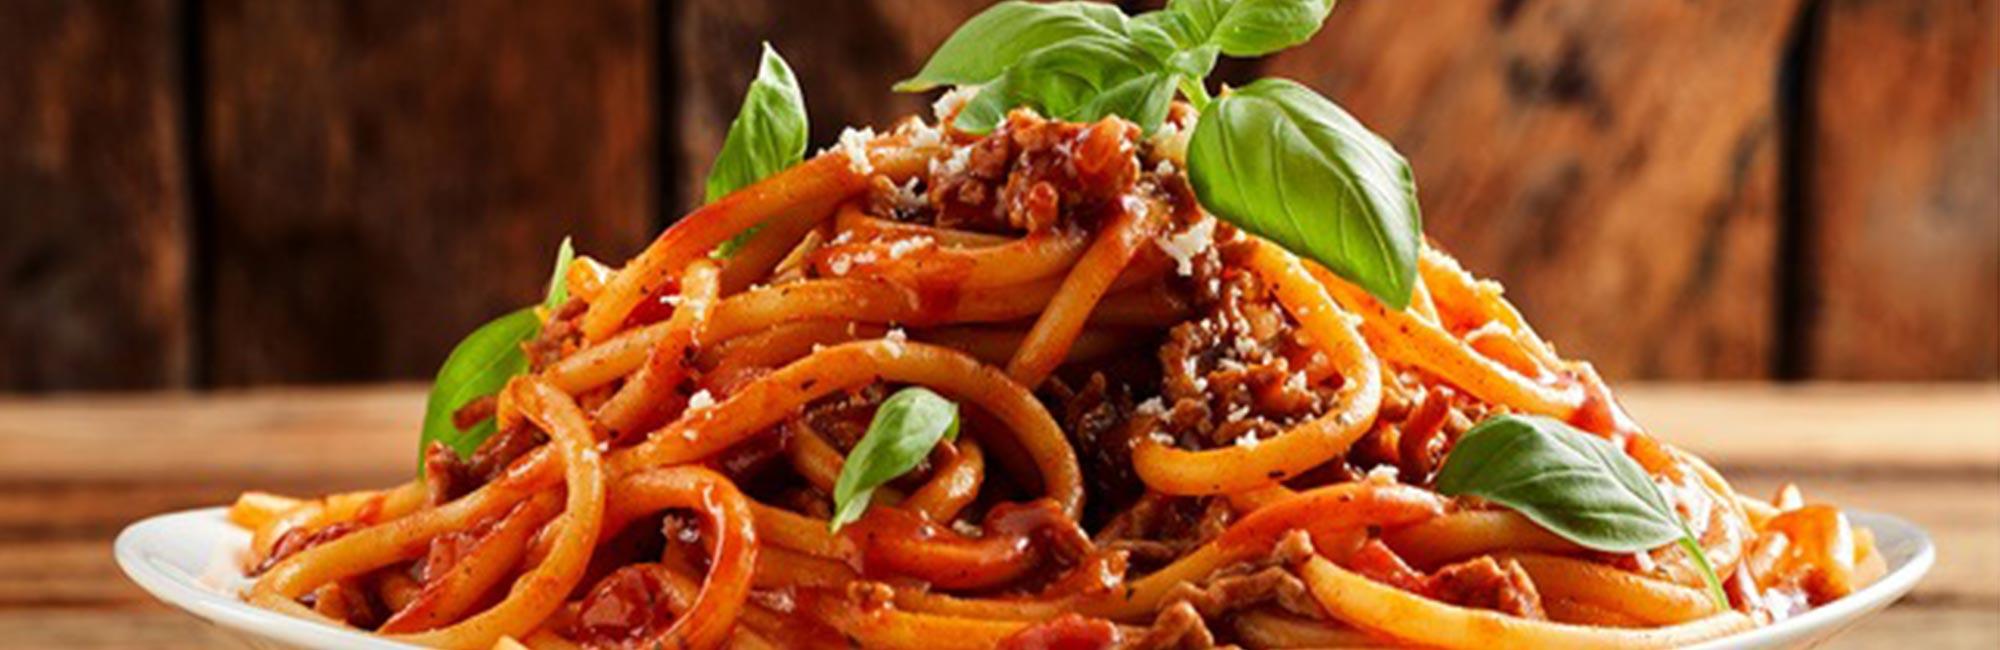 Spaghetti Bolognaise Recipe